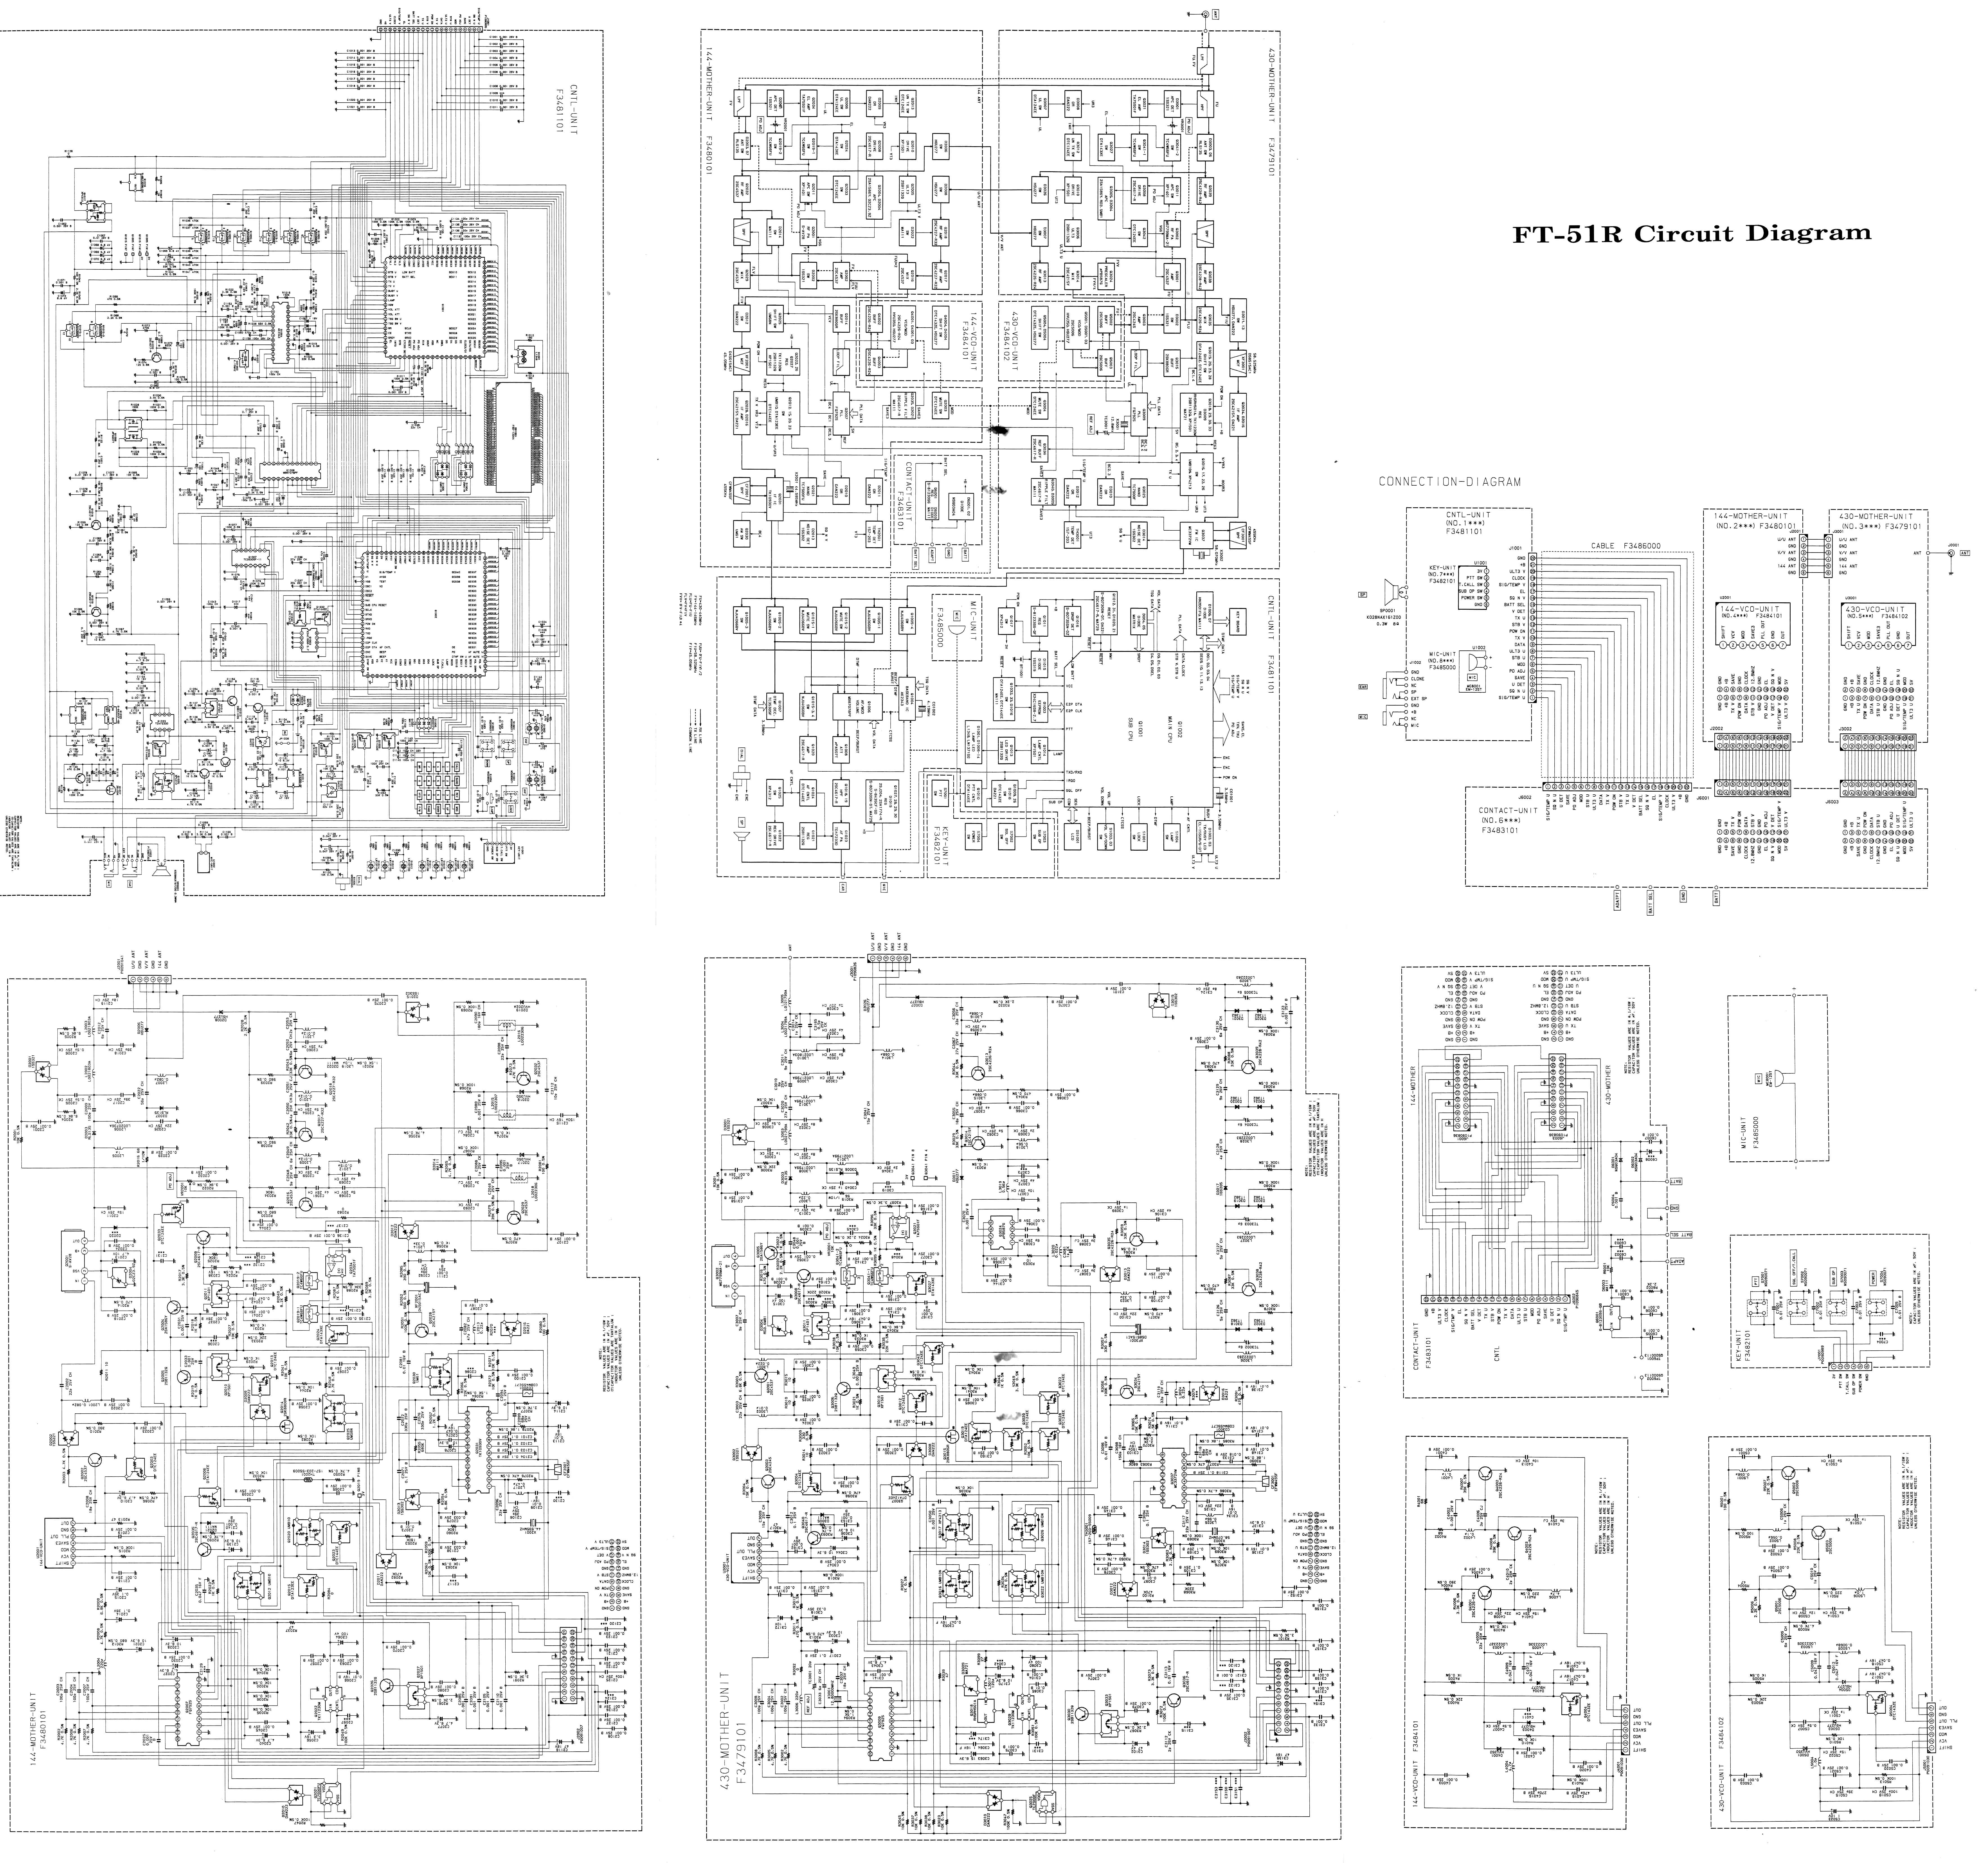 Rigpix Database - Schematics, Manuals 'n' Stuff - Cat 70 Pin Ecm Wiring Diagram